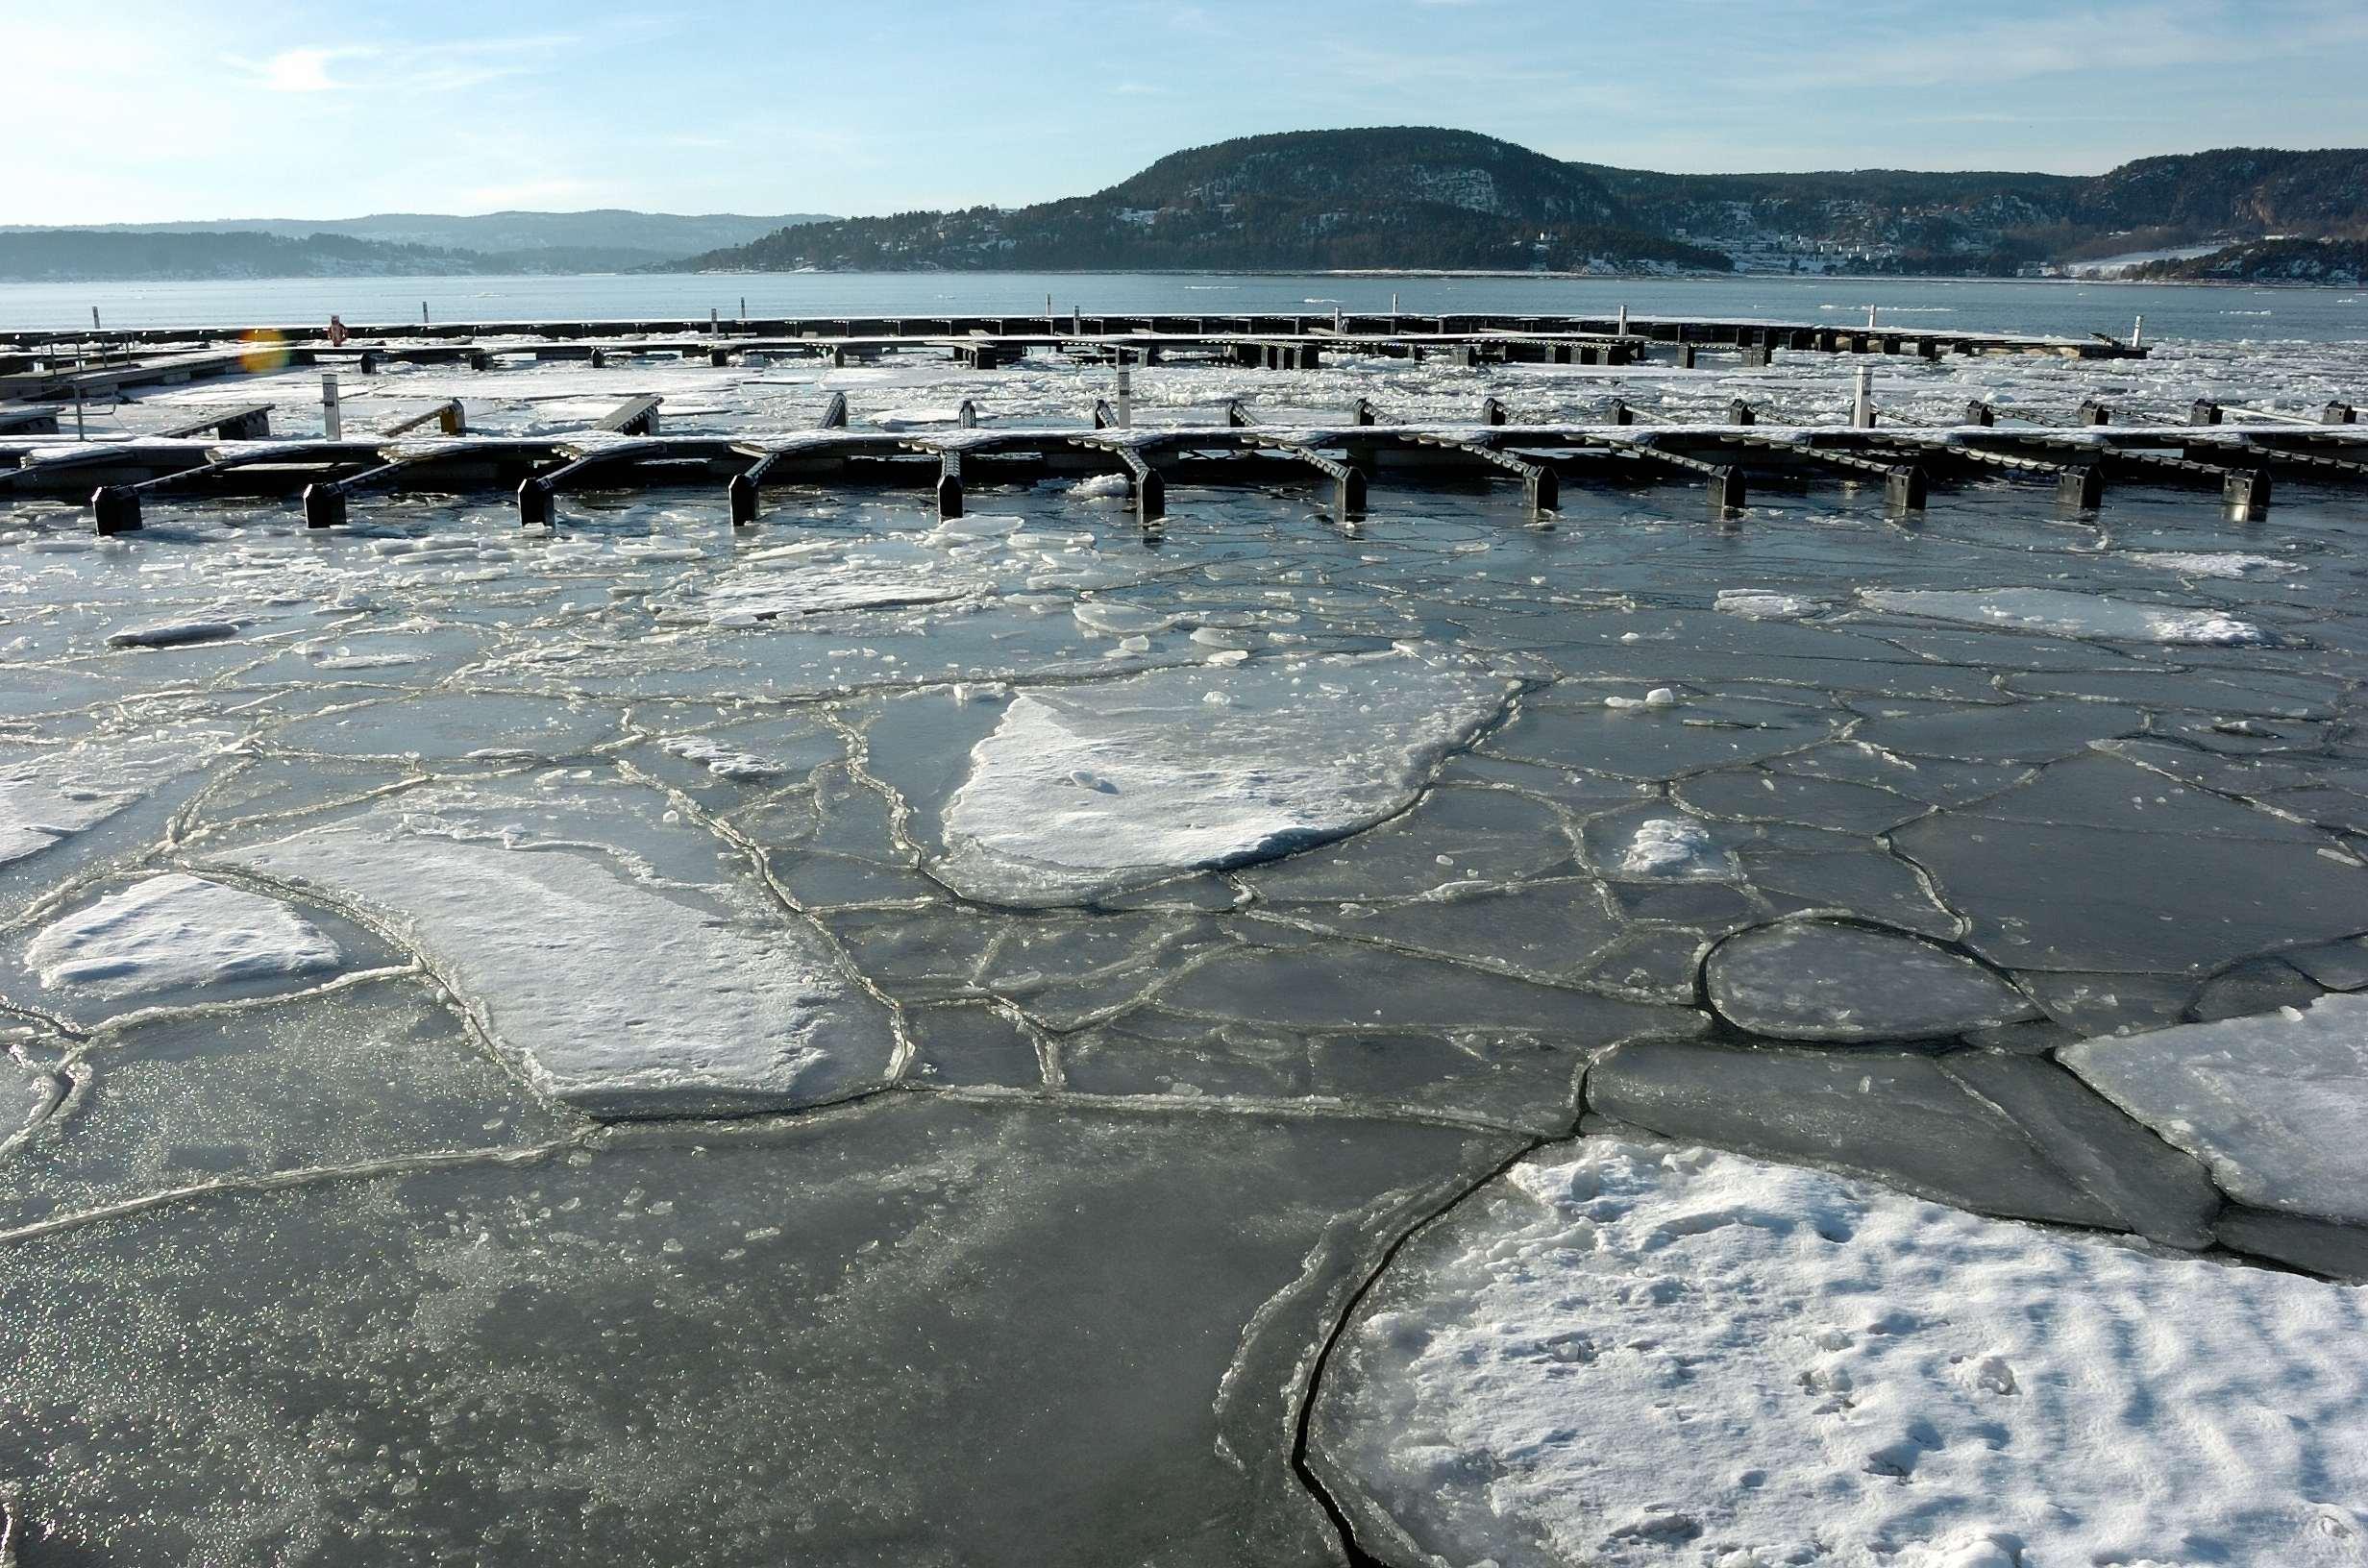 Rdtangen marina vinter 04 - LAV